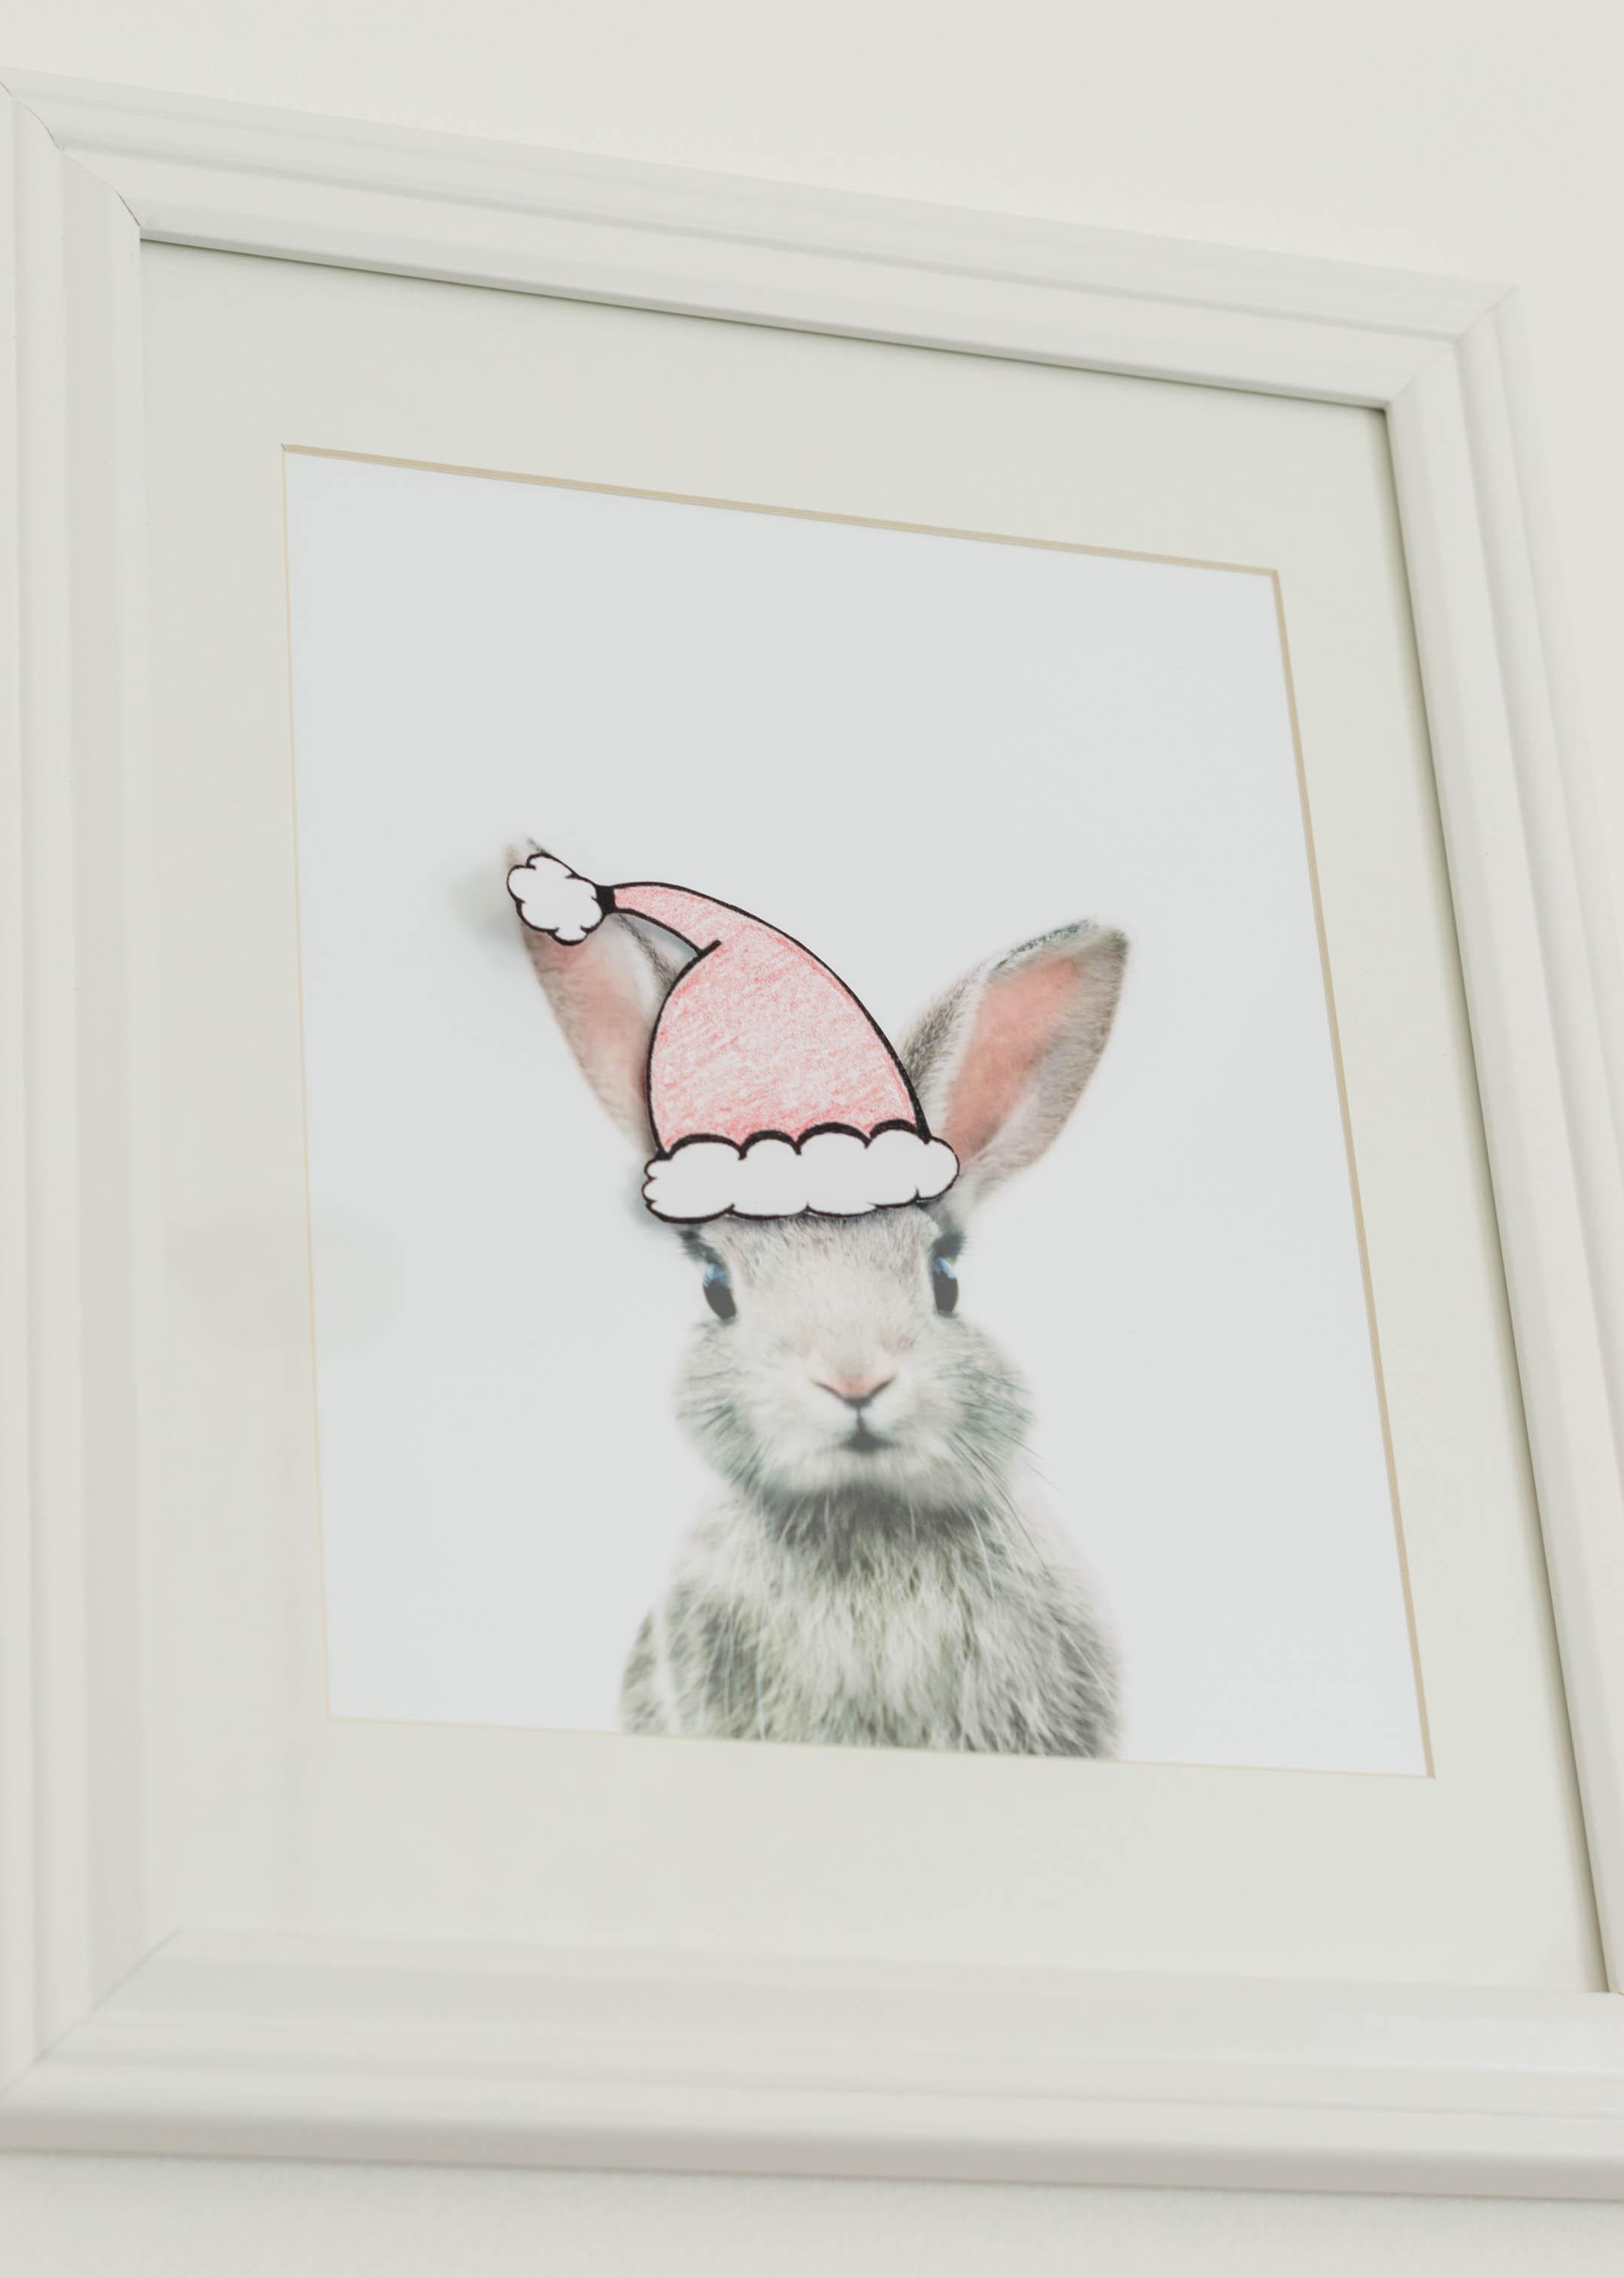 Nursery Decorating Ideas and Easy Christmas Wall Art